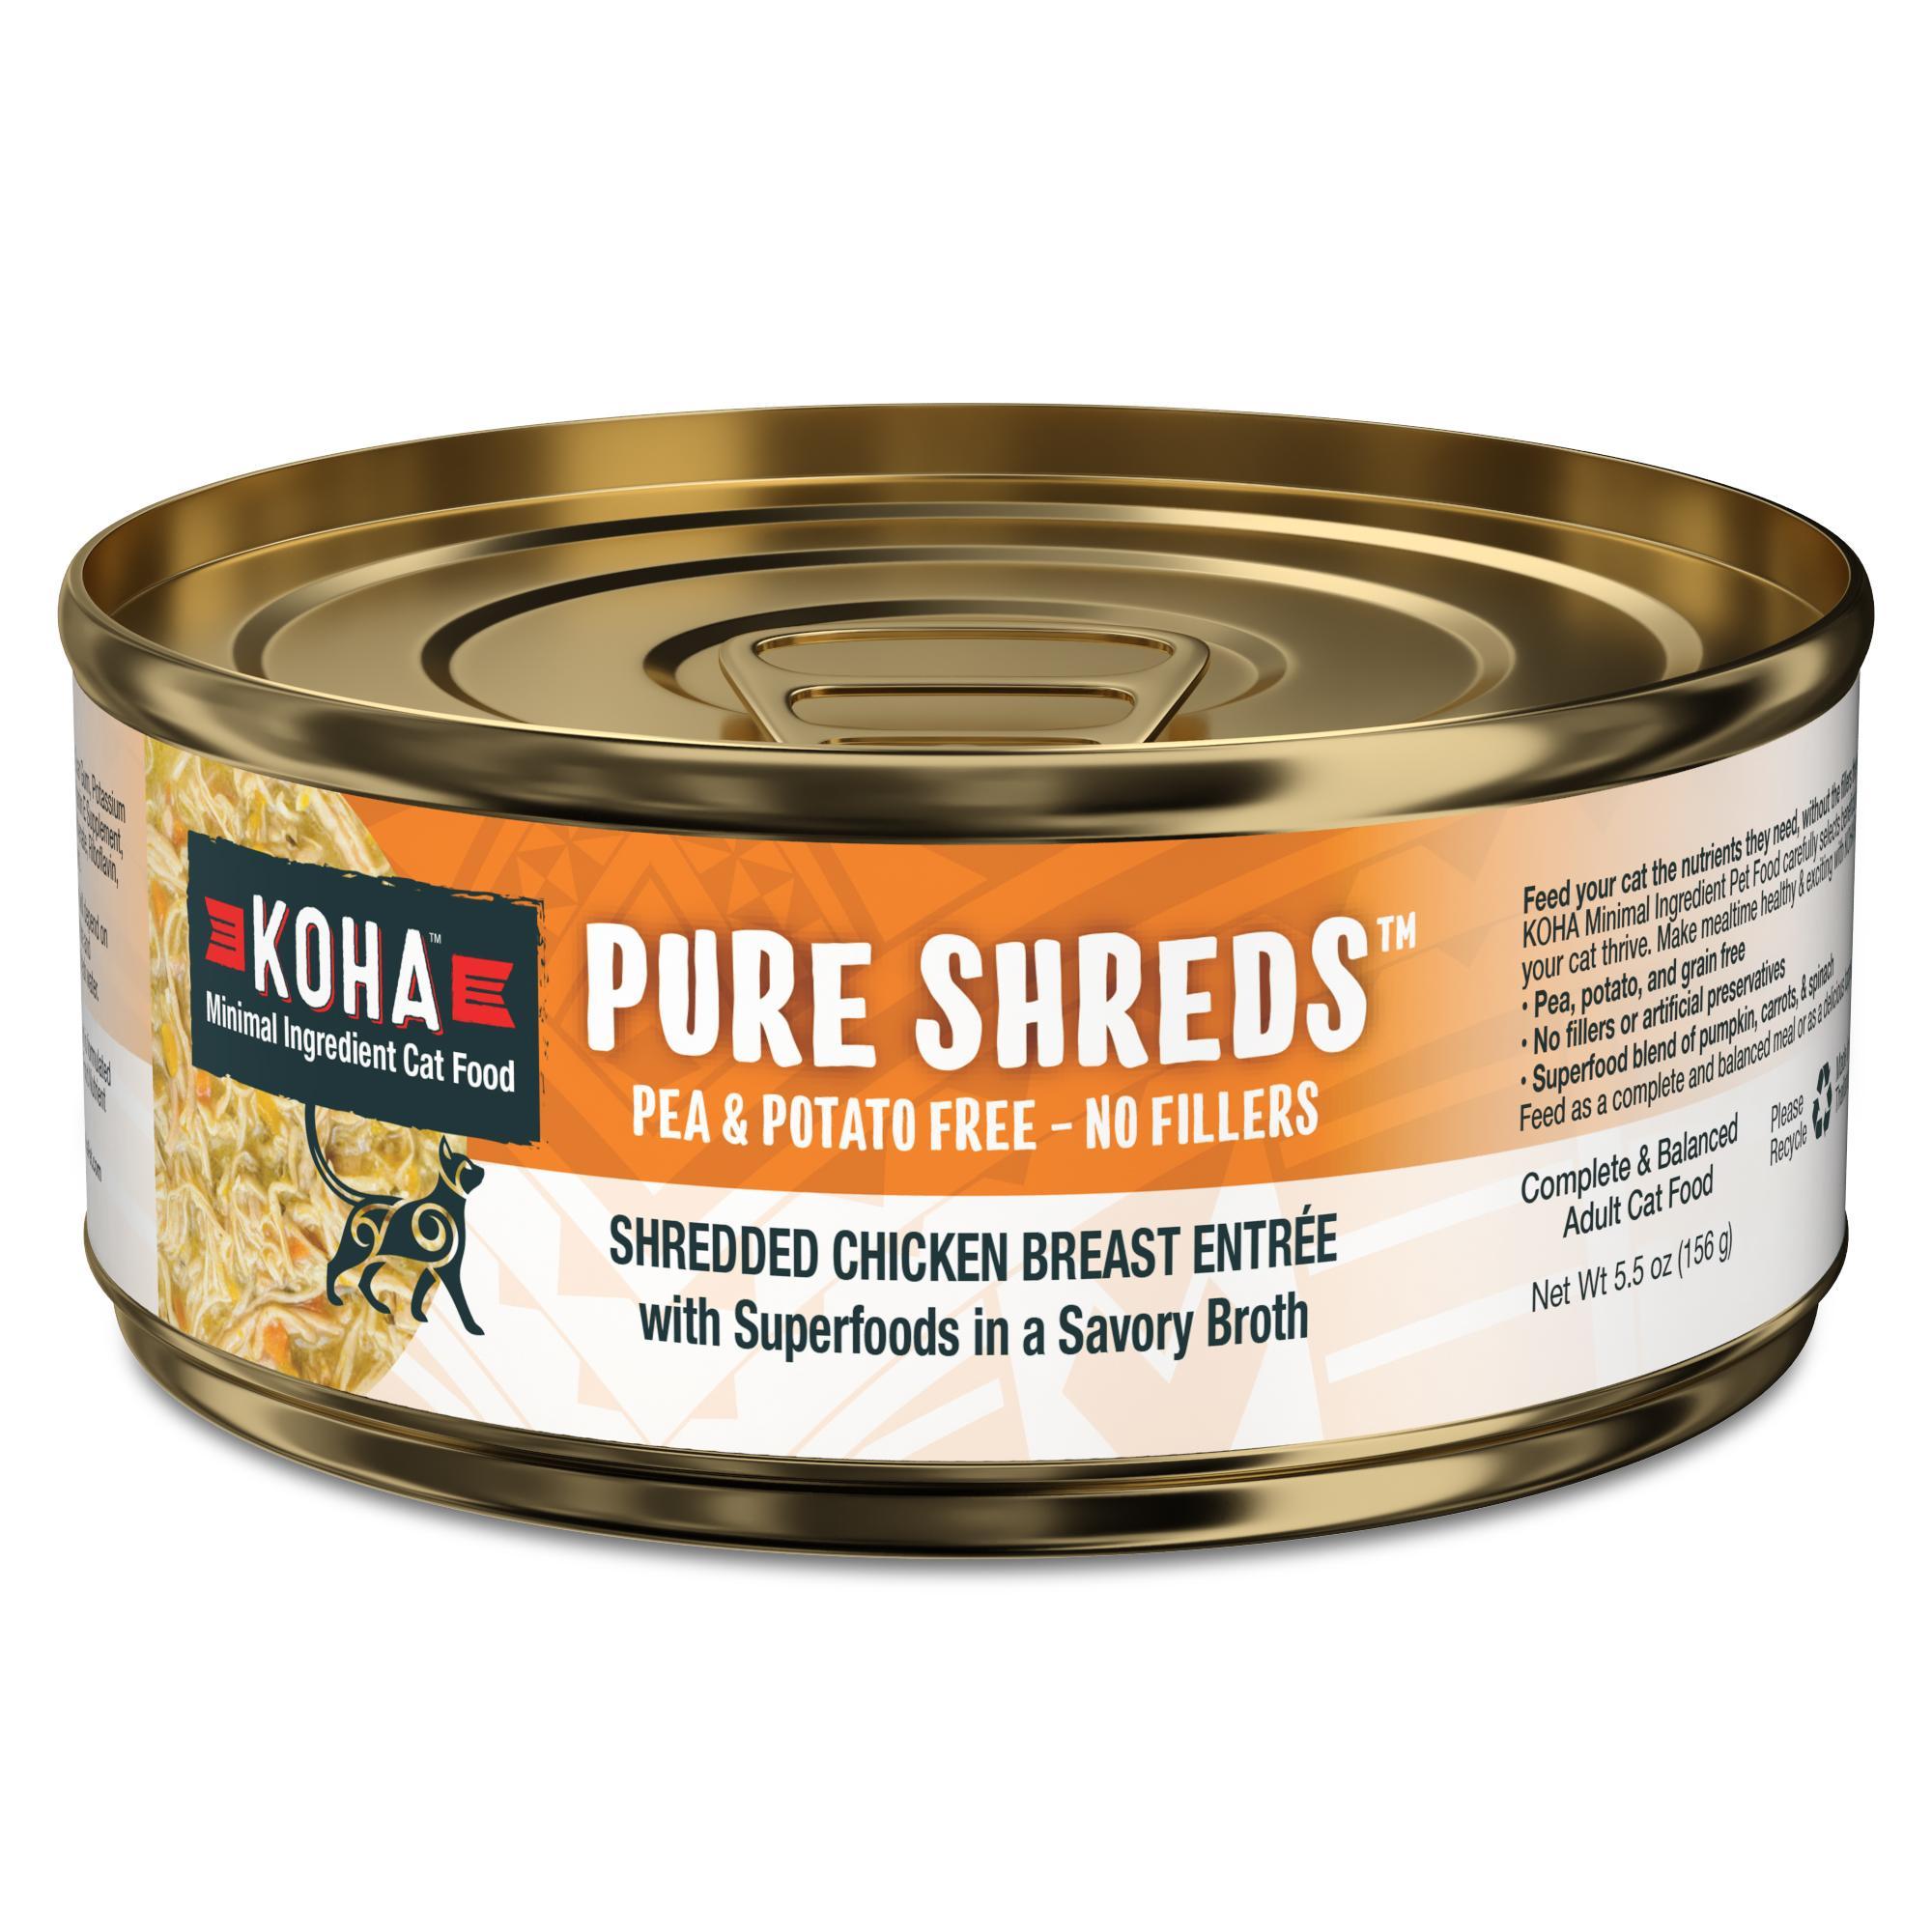 Koha Pure Shreds Shredded Chicken Breast Entrée Wet Cat Food, 5.5-oz